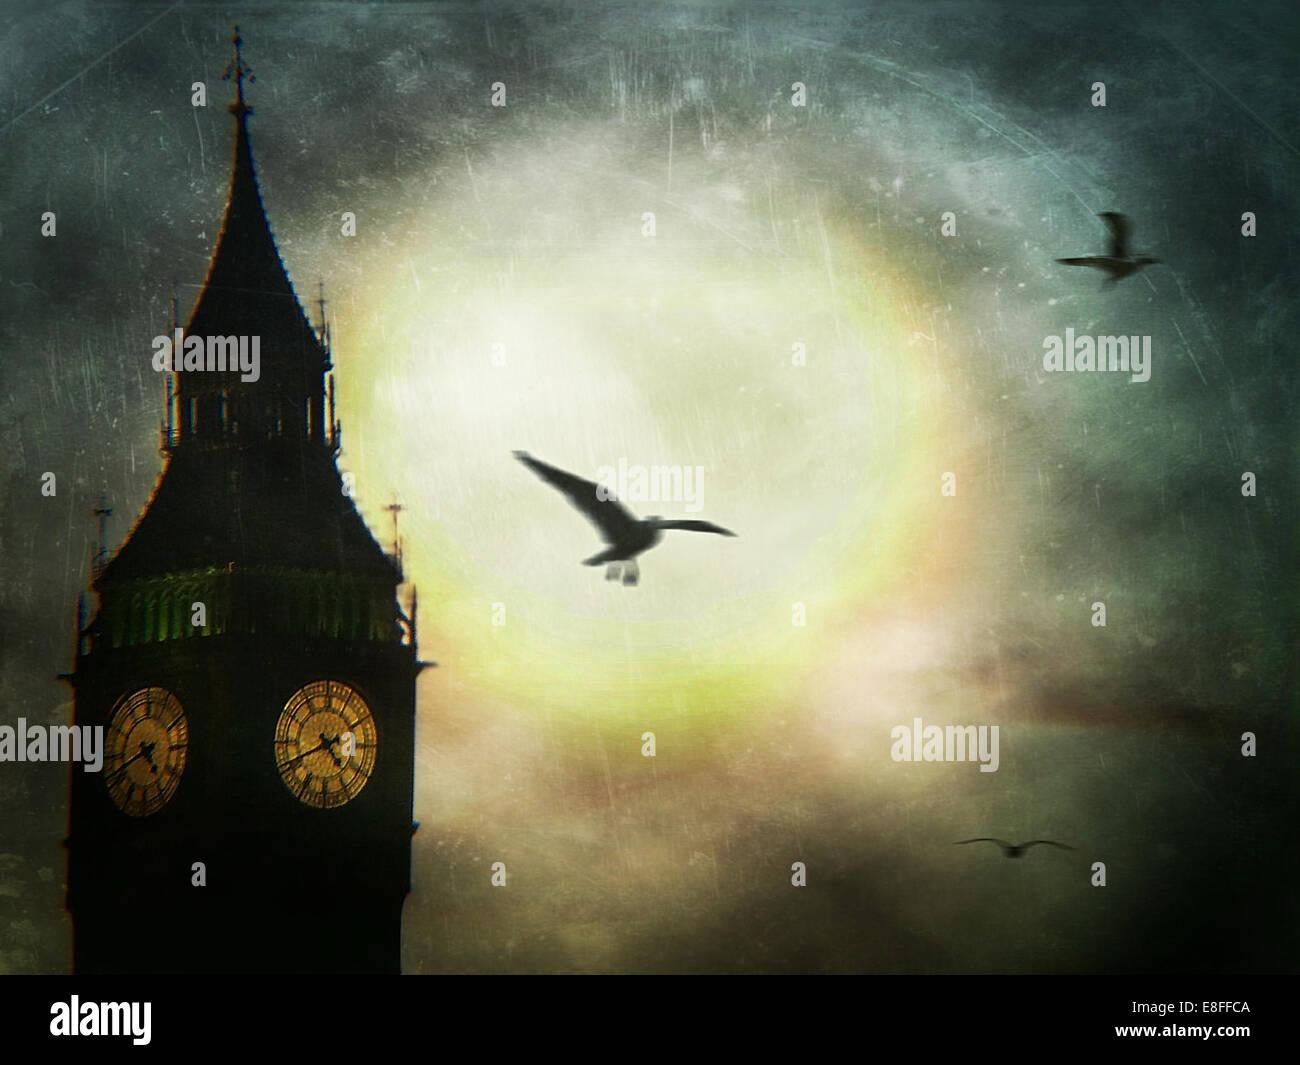 Birds flying past Big Ben, London, England, UK - Stock Image